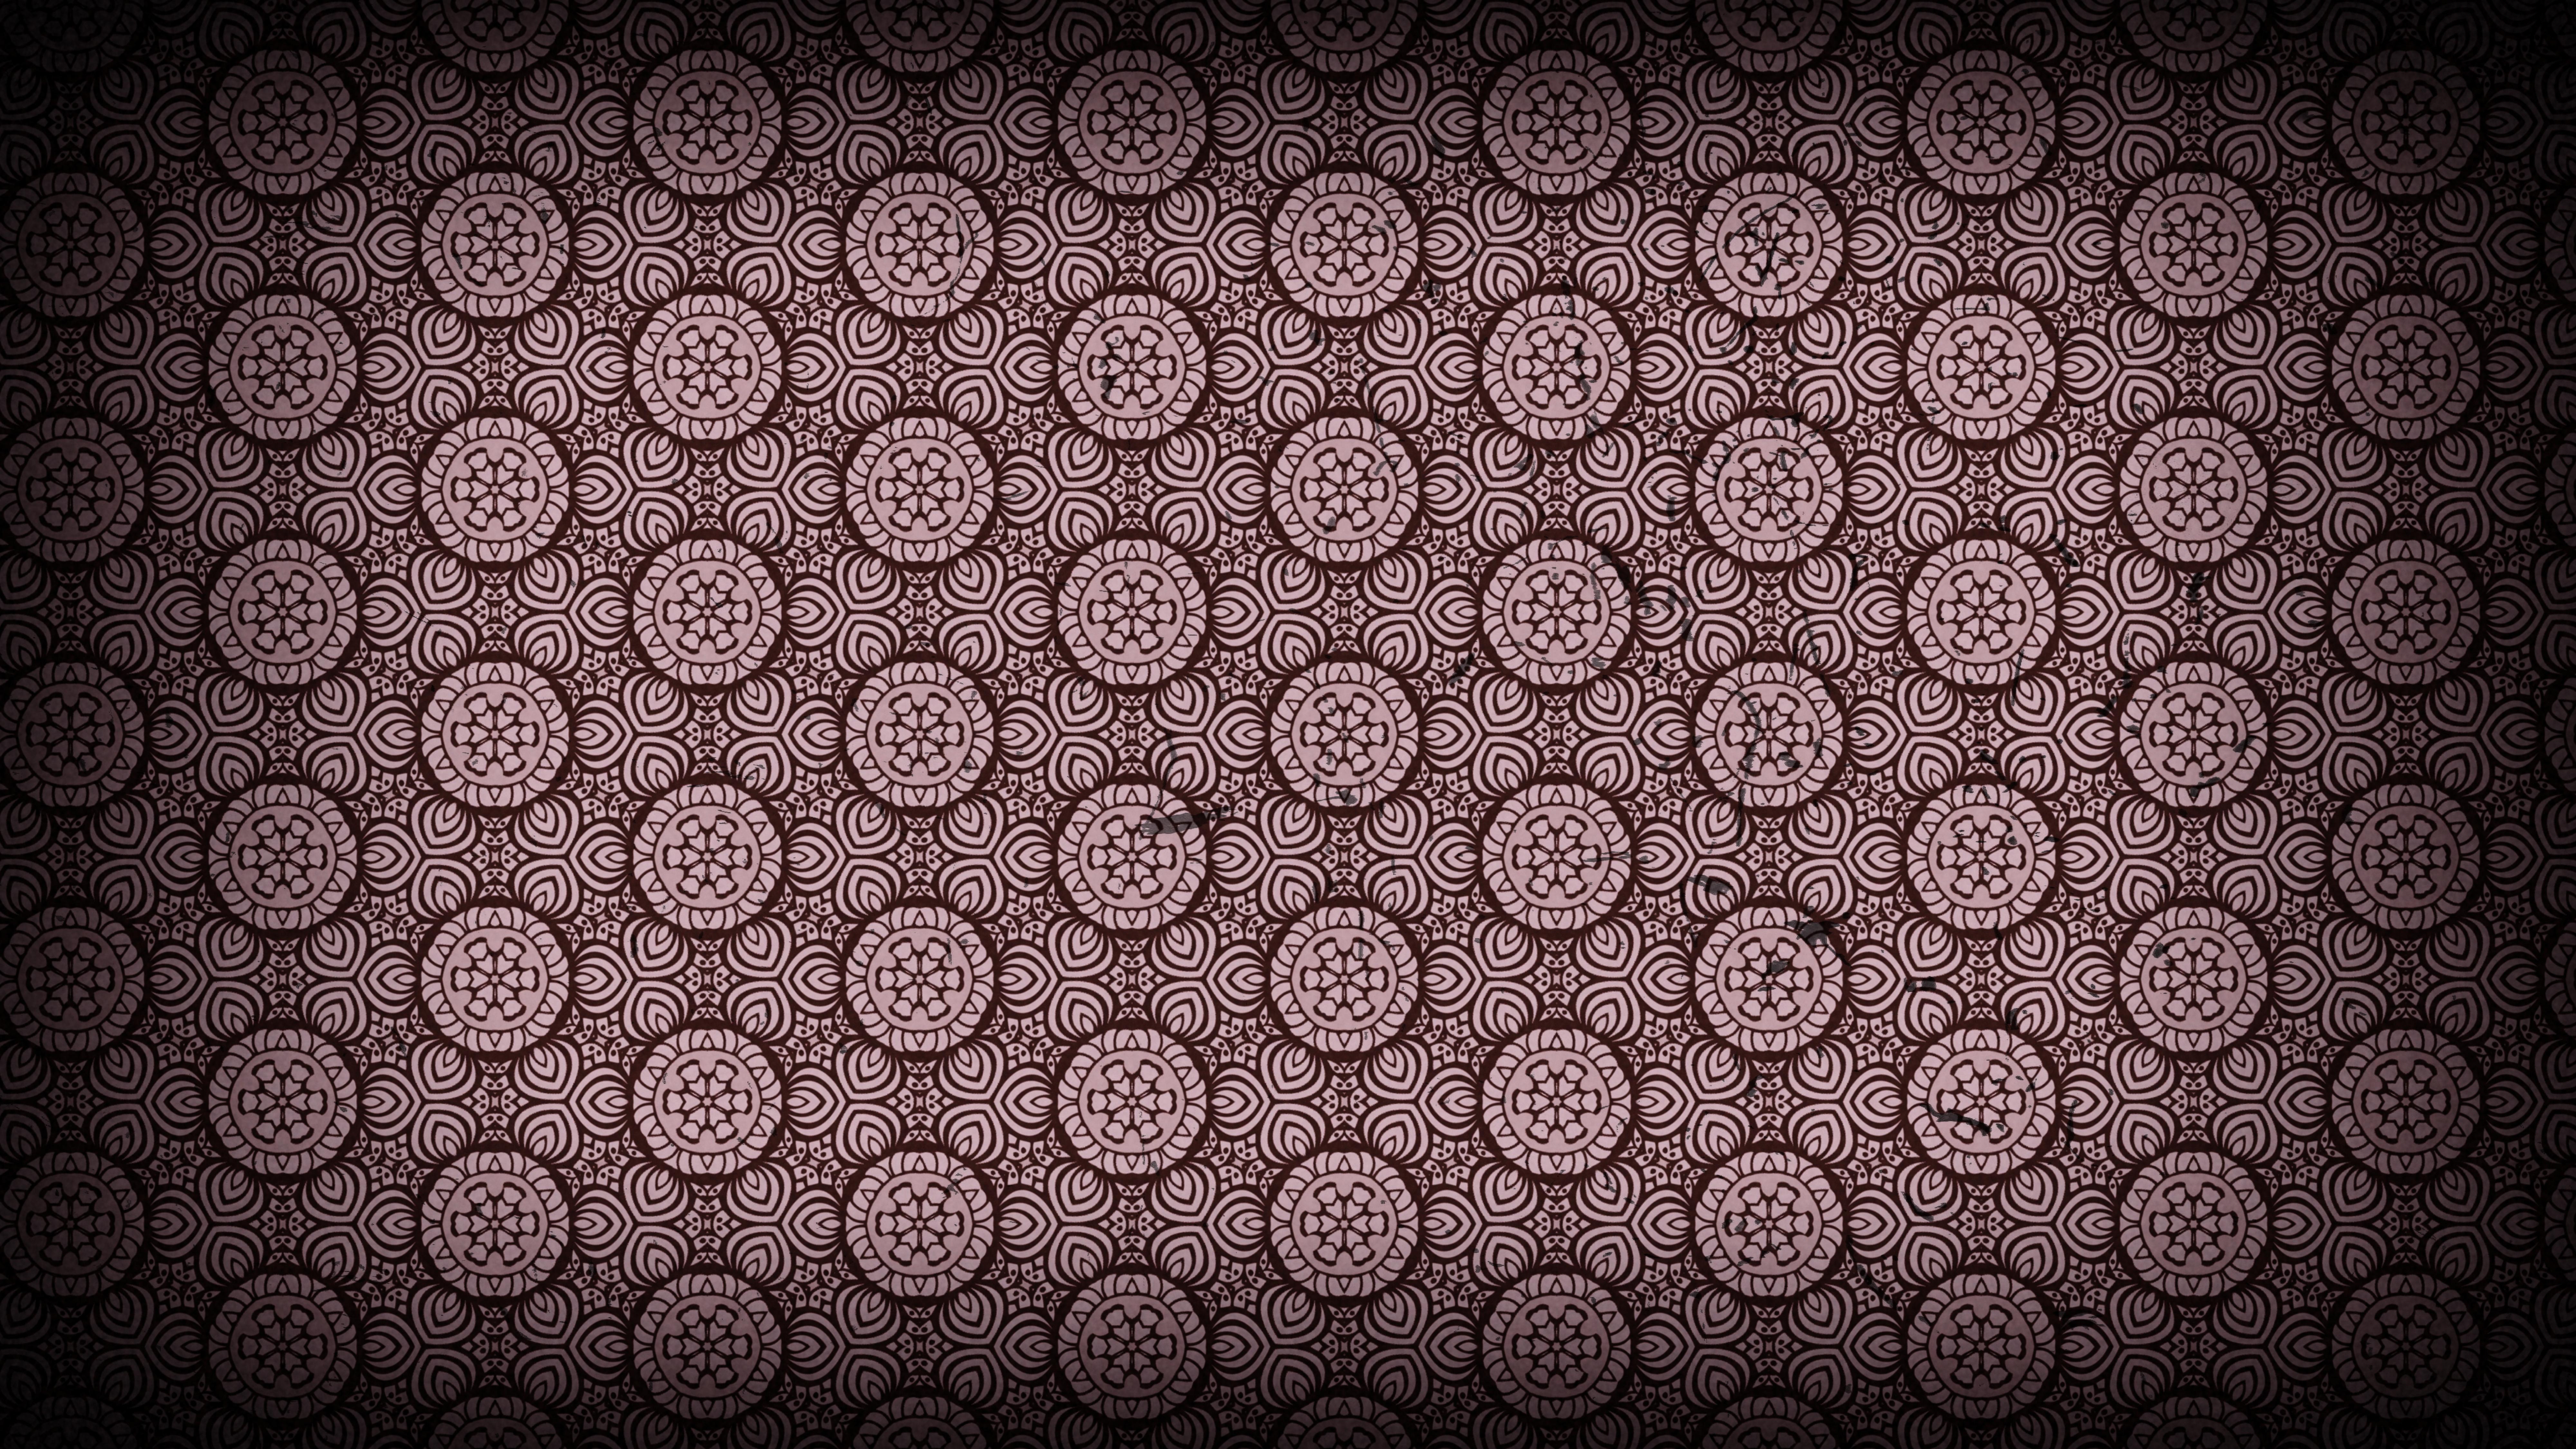 Red And Black Vintage Ornamental Pattern Wallpaper